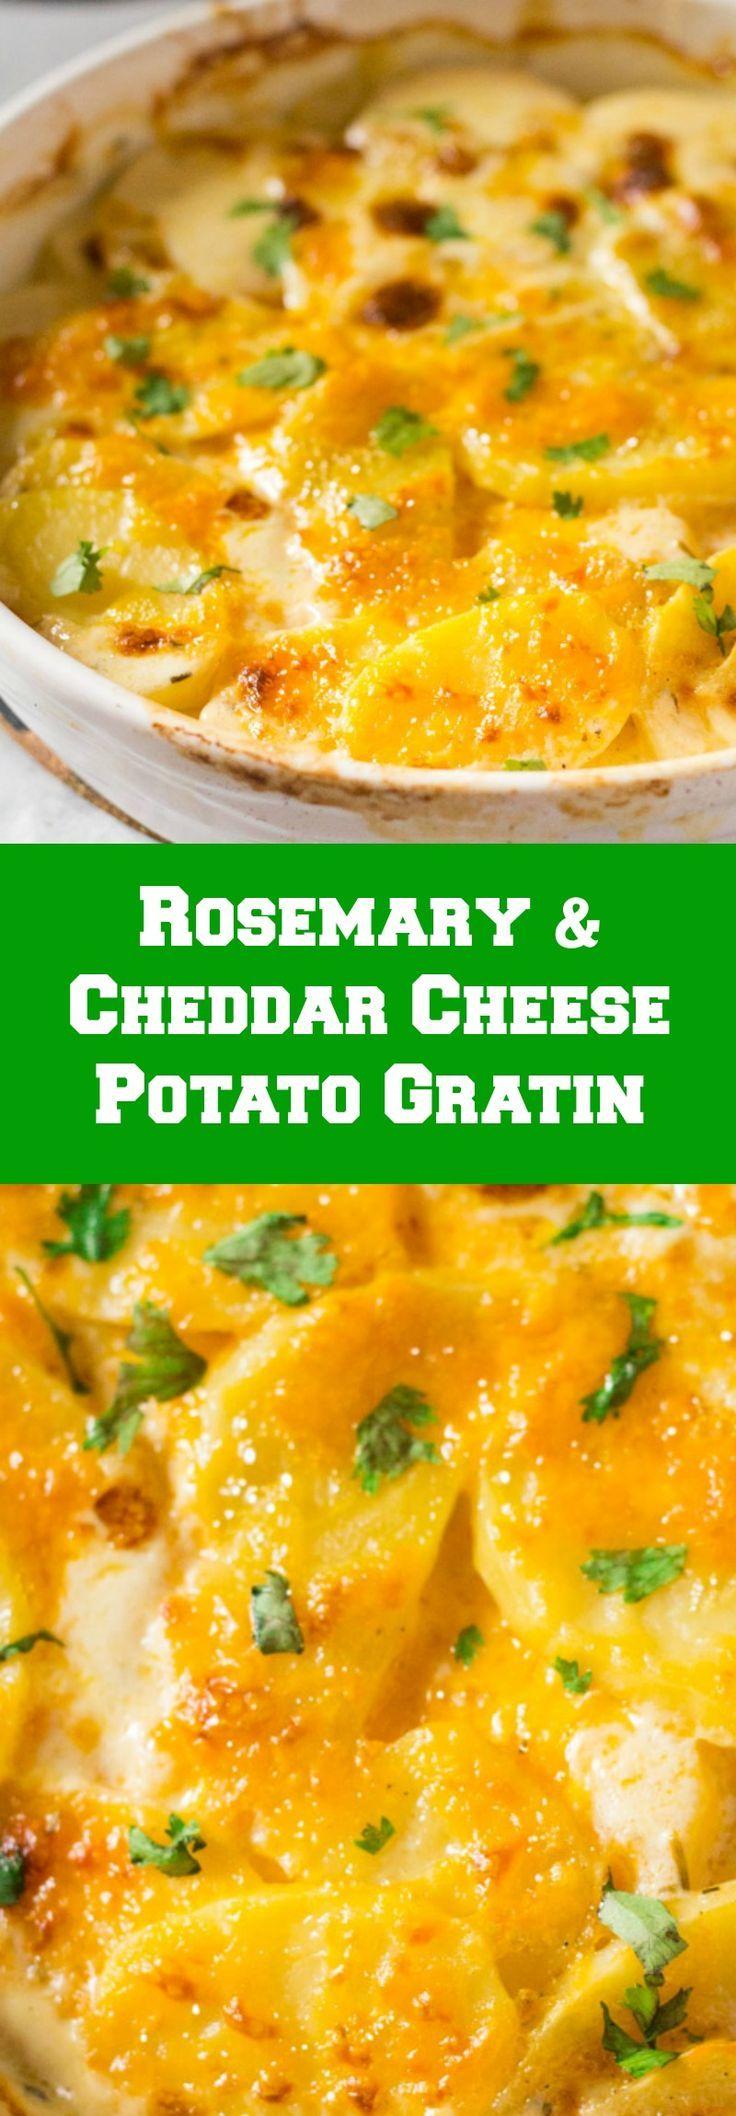 ... -Potatoes on Pinterest | Cheesy potato casserole, Potatoes and Gratin